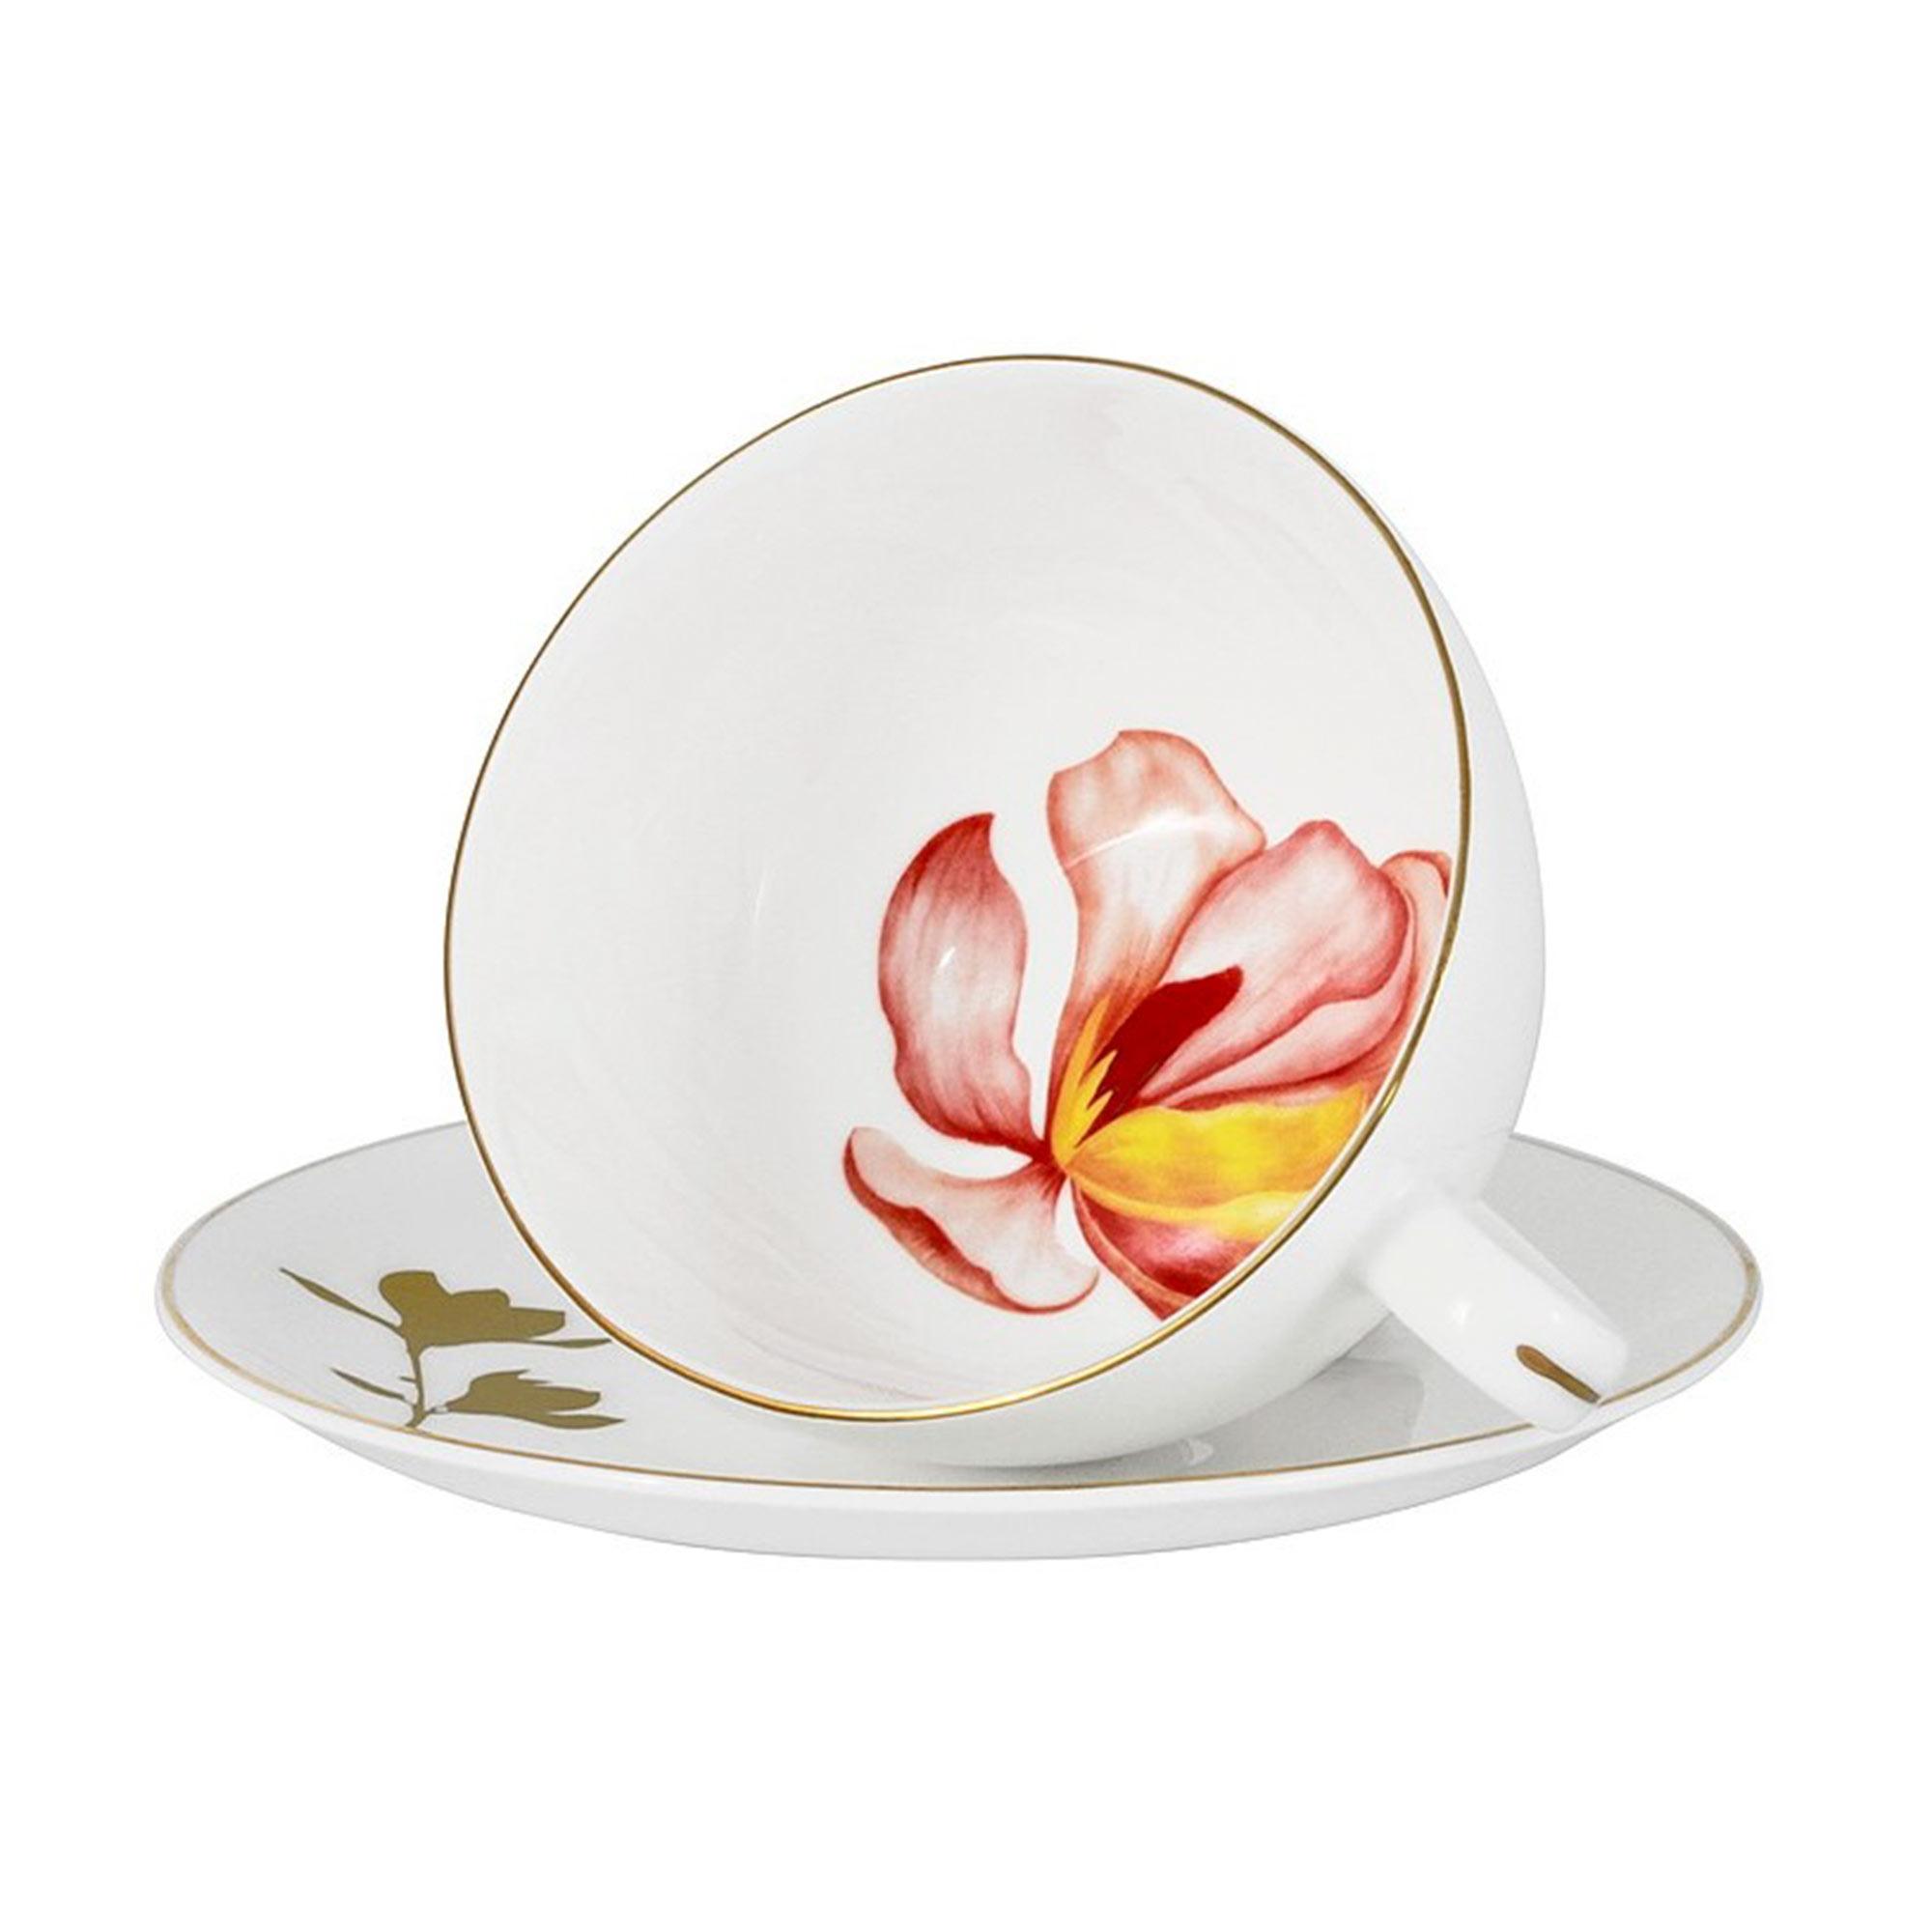 Фото - Чашка с блюдцем Anna Lafarg Emily Magnolia 250 мл салатник anna lafarg emily magnolia 14 см 750 мл